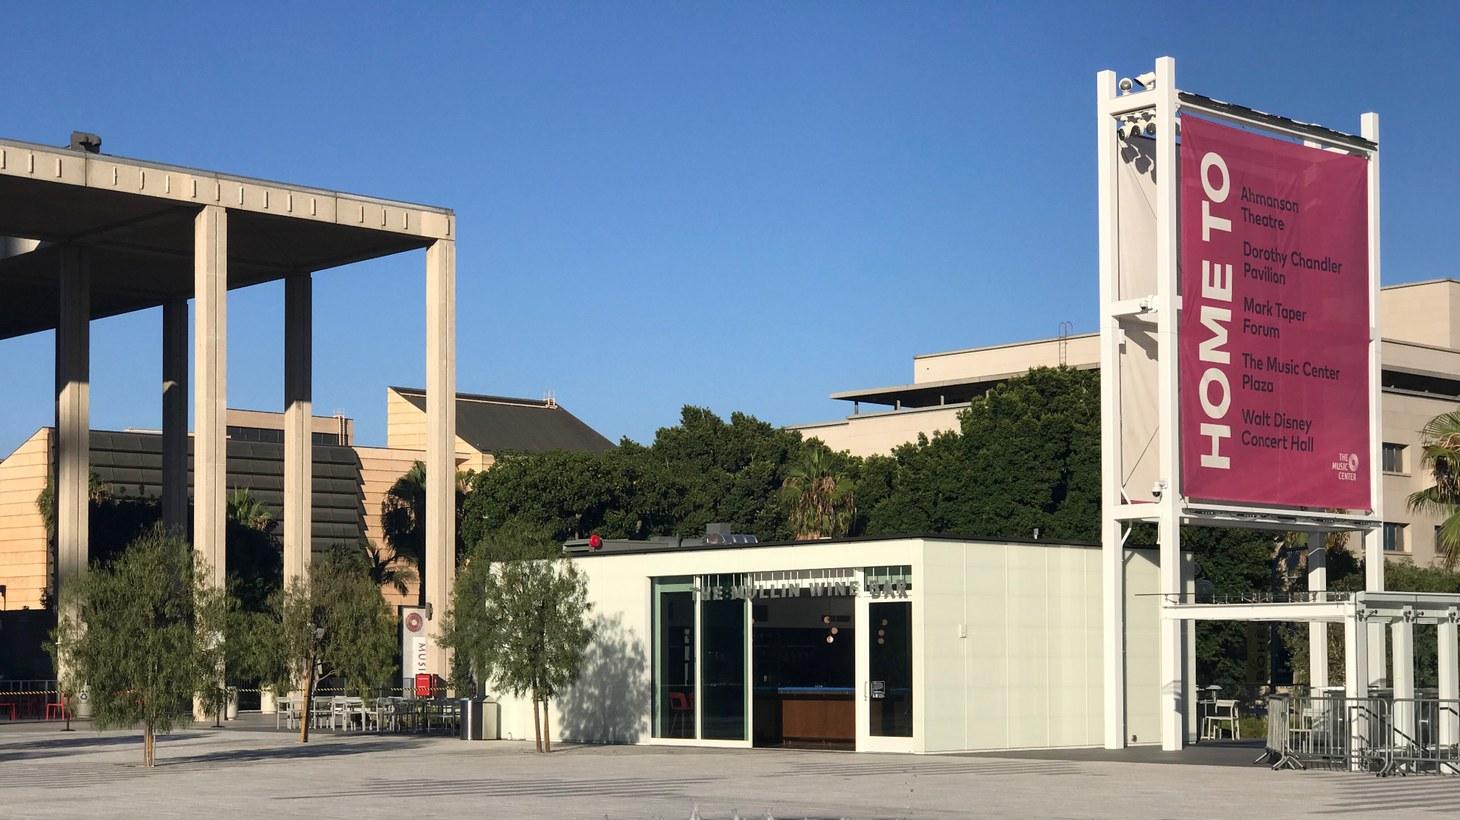 Music Center Plaza